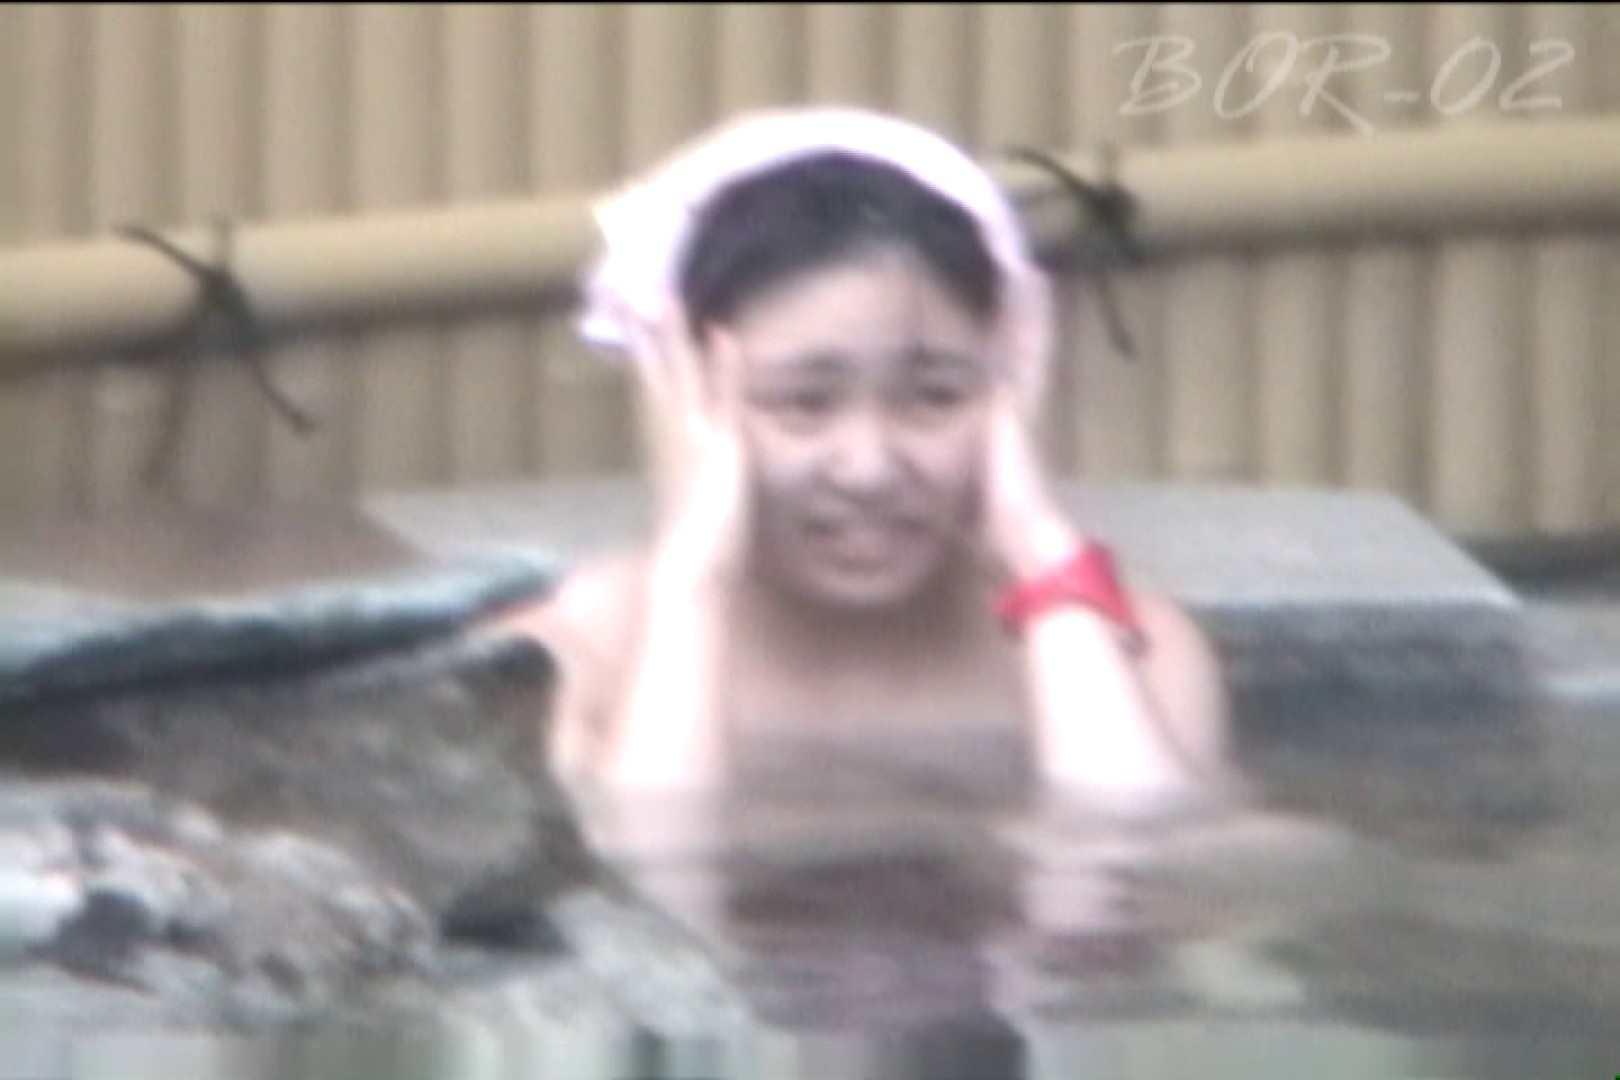 Aquaな露天風呂Vol.475 露天 | OLセックス  96画像 40